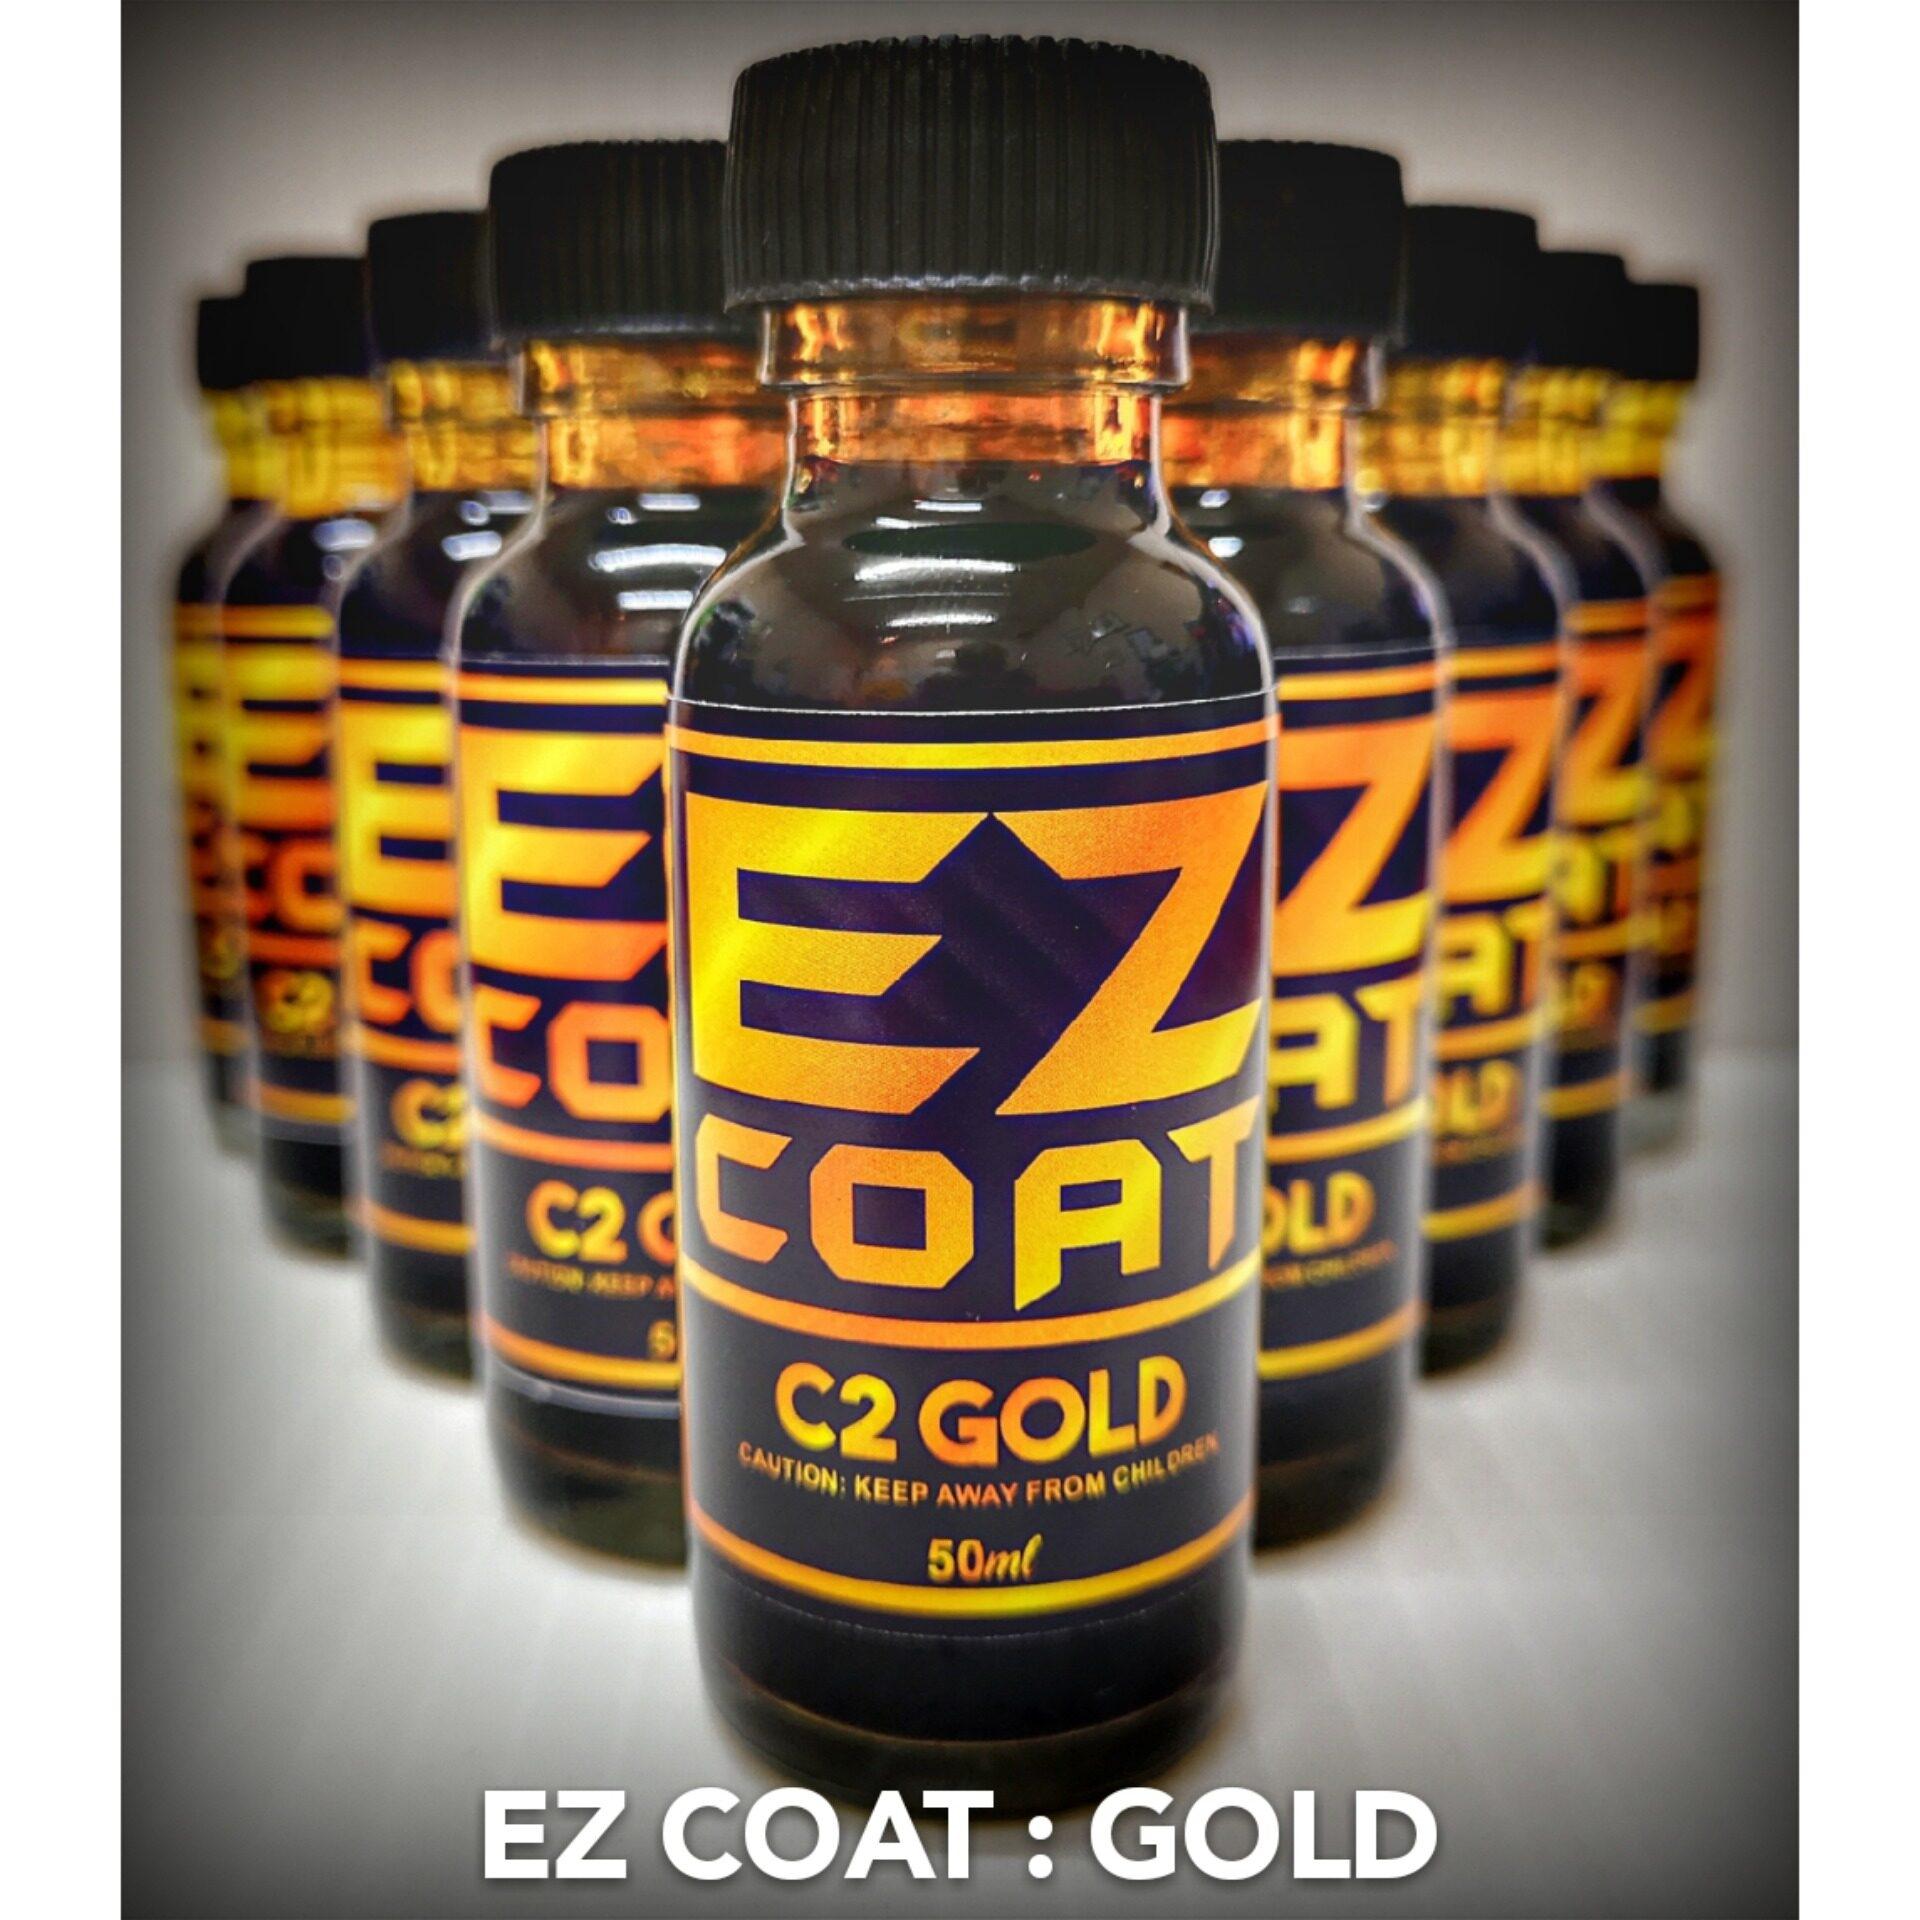 EZ COAT(C2 GLOSSY GOLD)